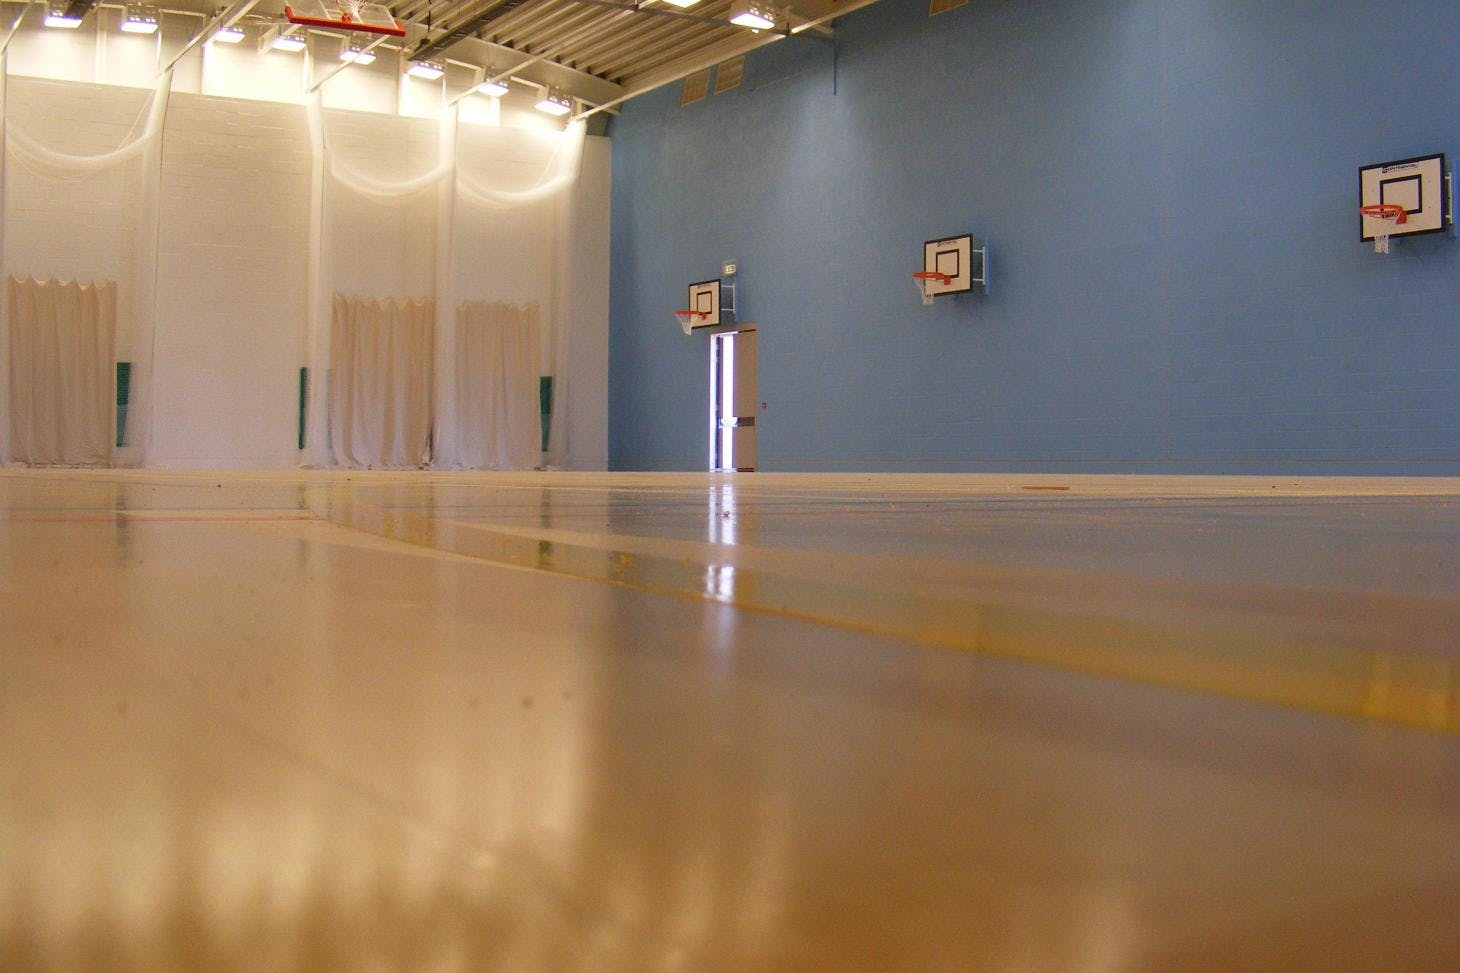 Dagenham Park Leisure Centre Nets | Grass cricket facilities